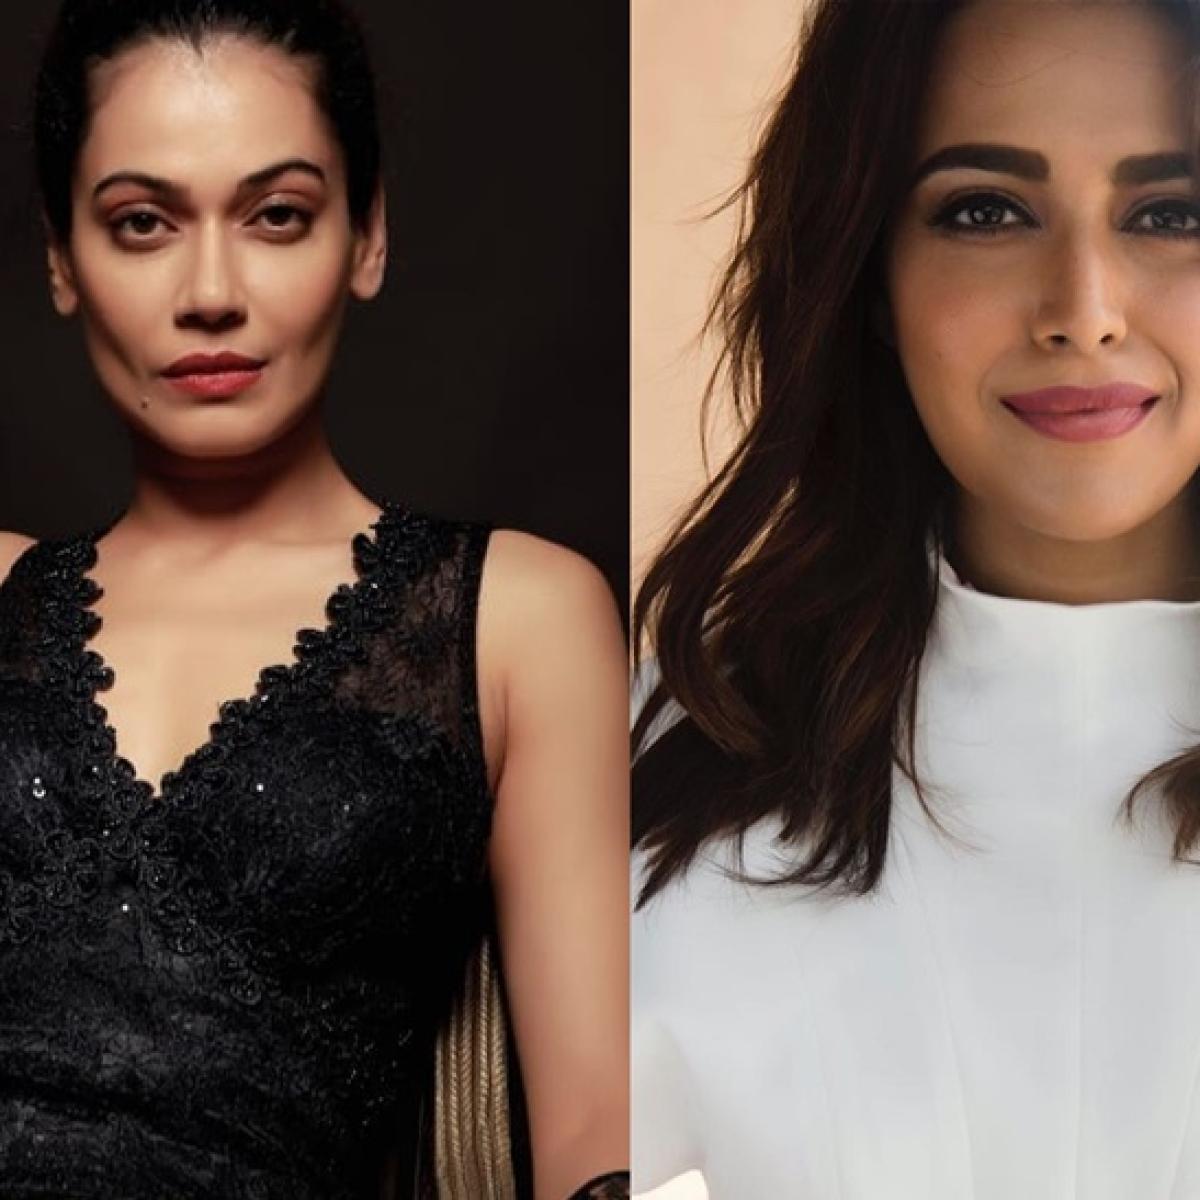 'Didi, zeher ki ulti karney ke pehley fact check karo na kabhi kabhi': Swara Bhasker hits out at Payal Rohatgi